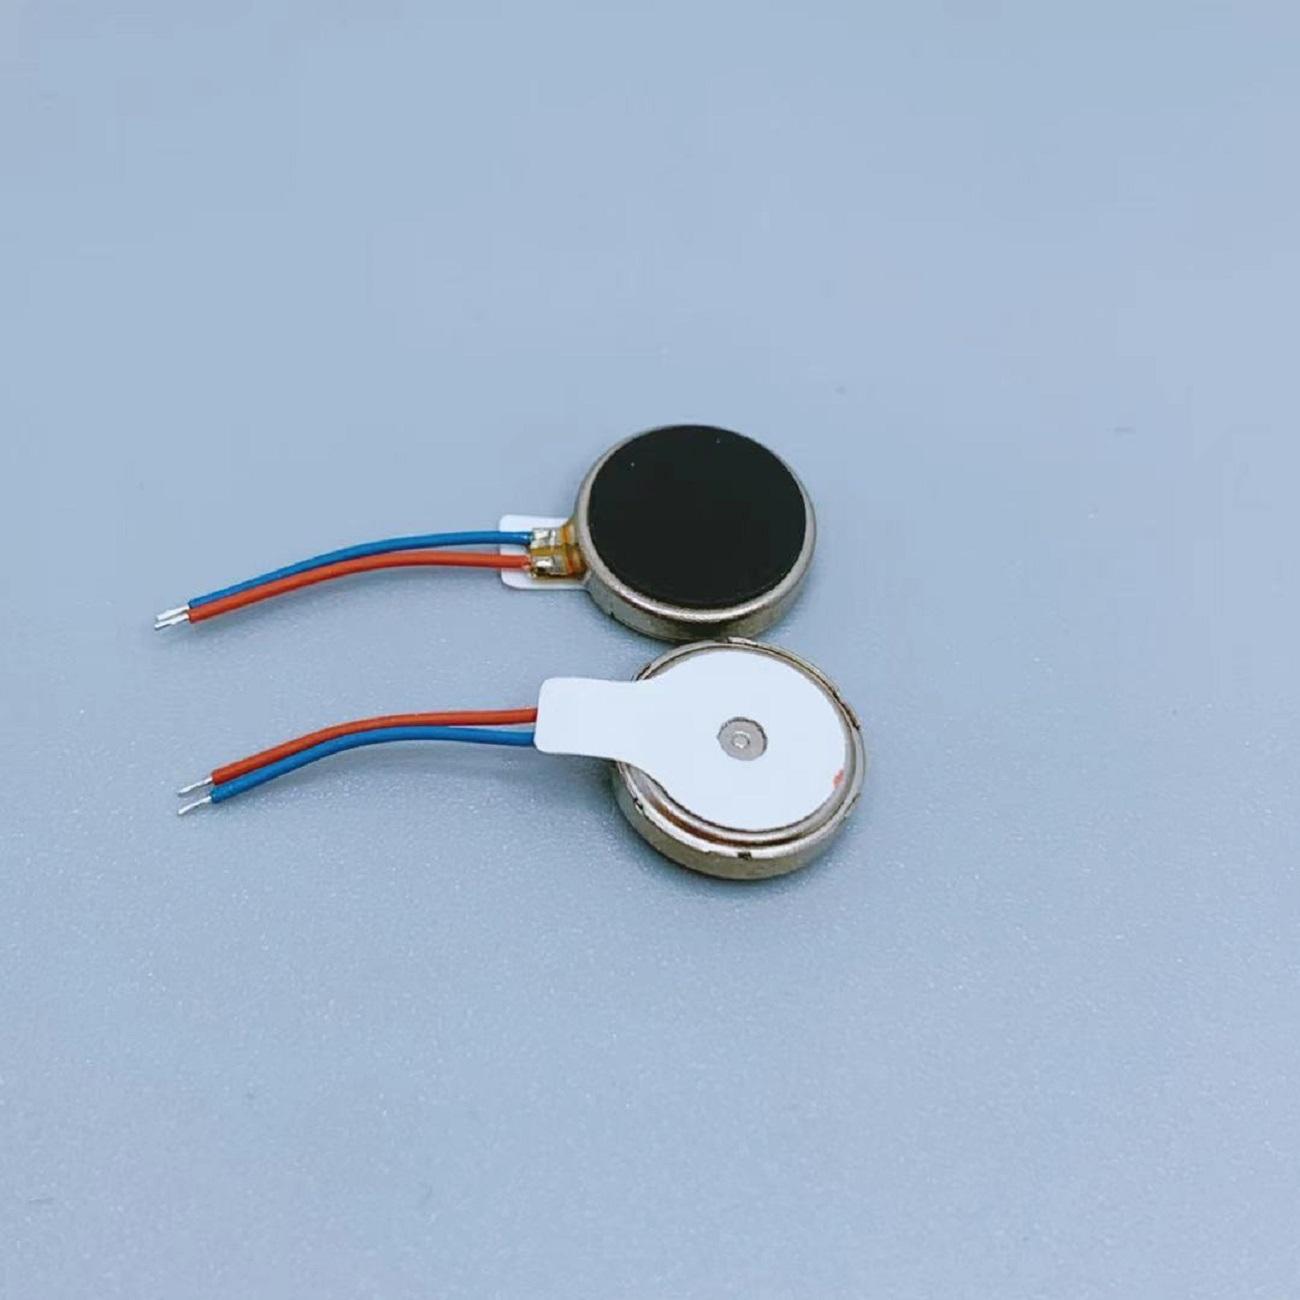 Dia 10mm*2.0mm Smartphone Vibrator | Mini Vibration | LEADER LCM-1020